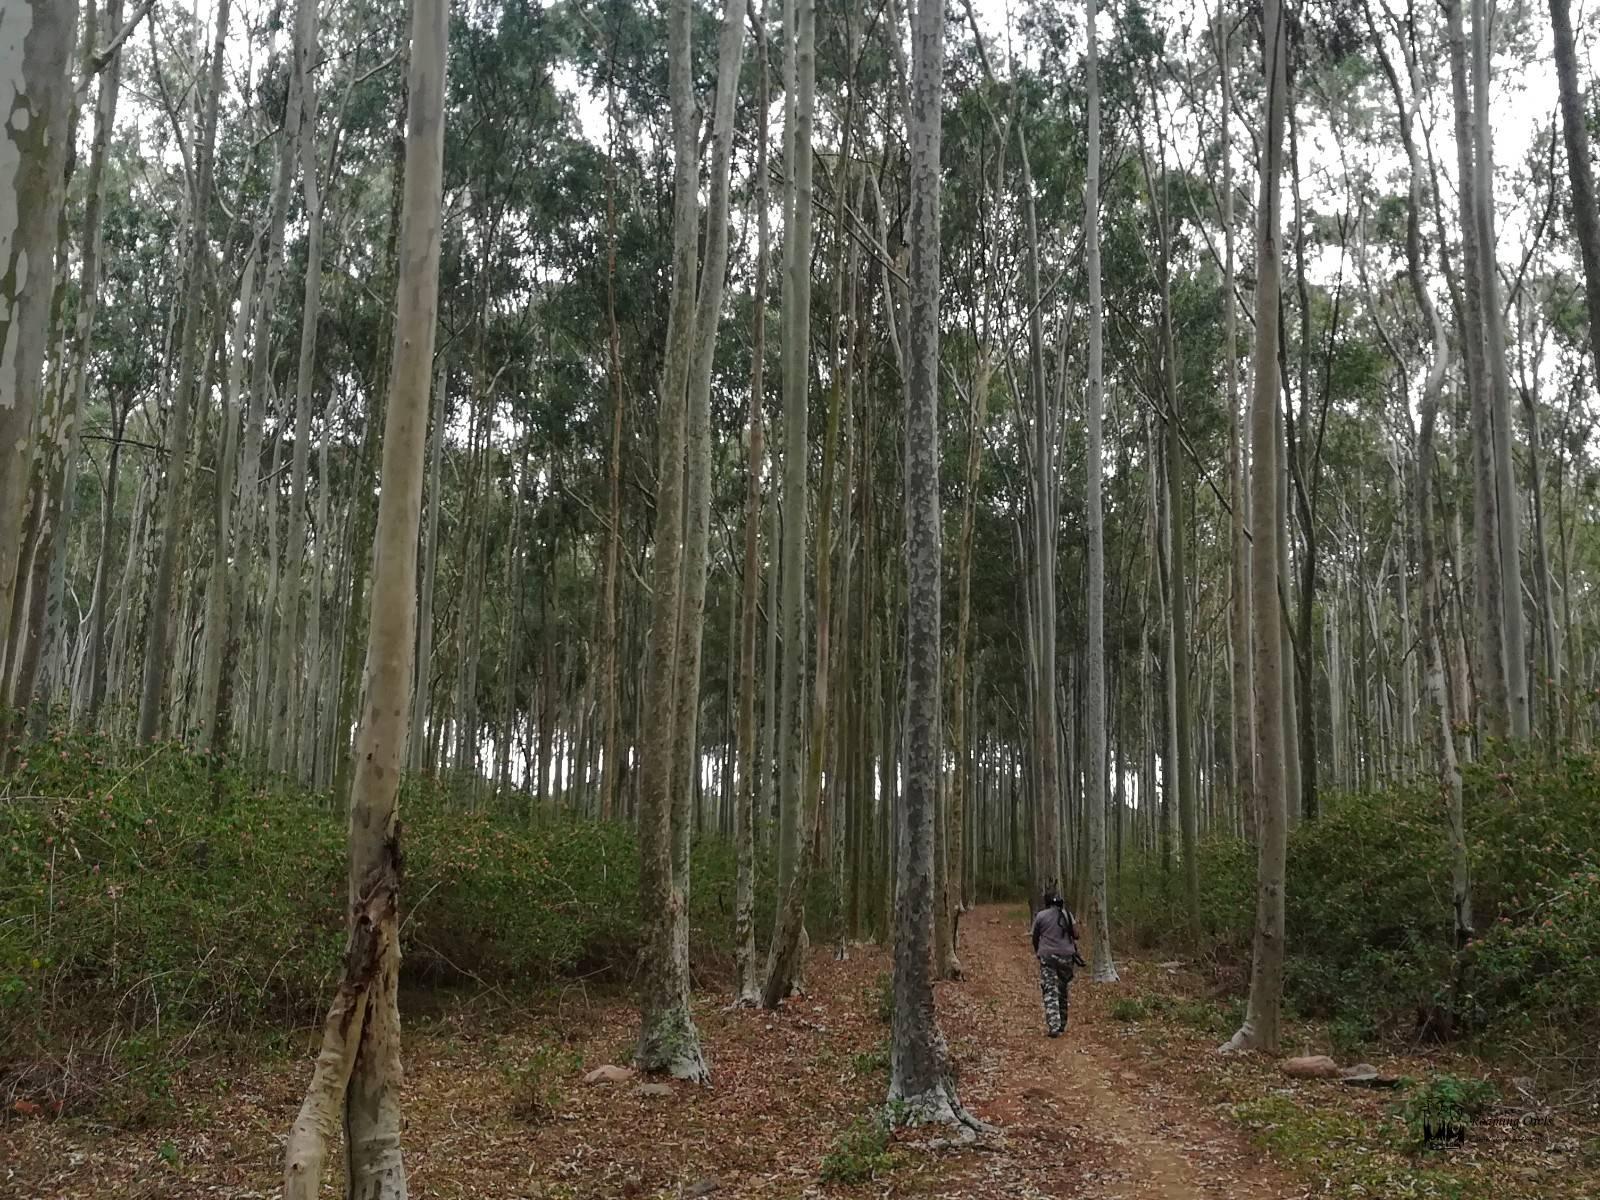 Yelagiri Eucalyptus,Tamilnadu Eucalyptus forest,Shanti Chellappa